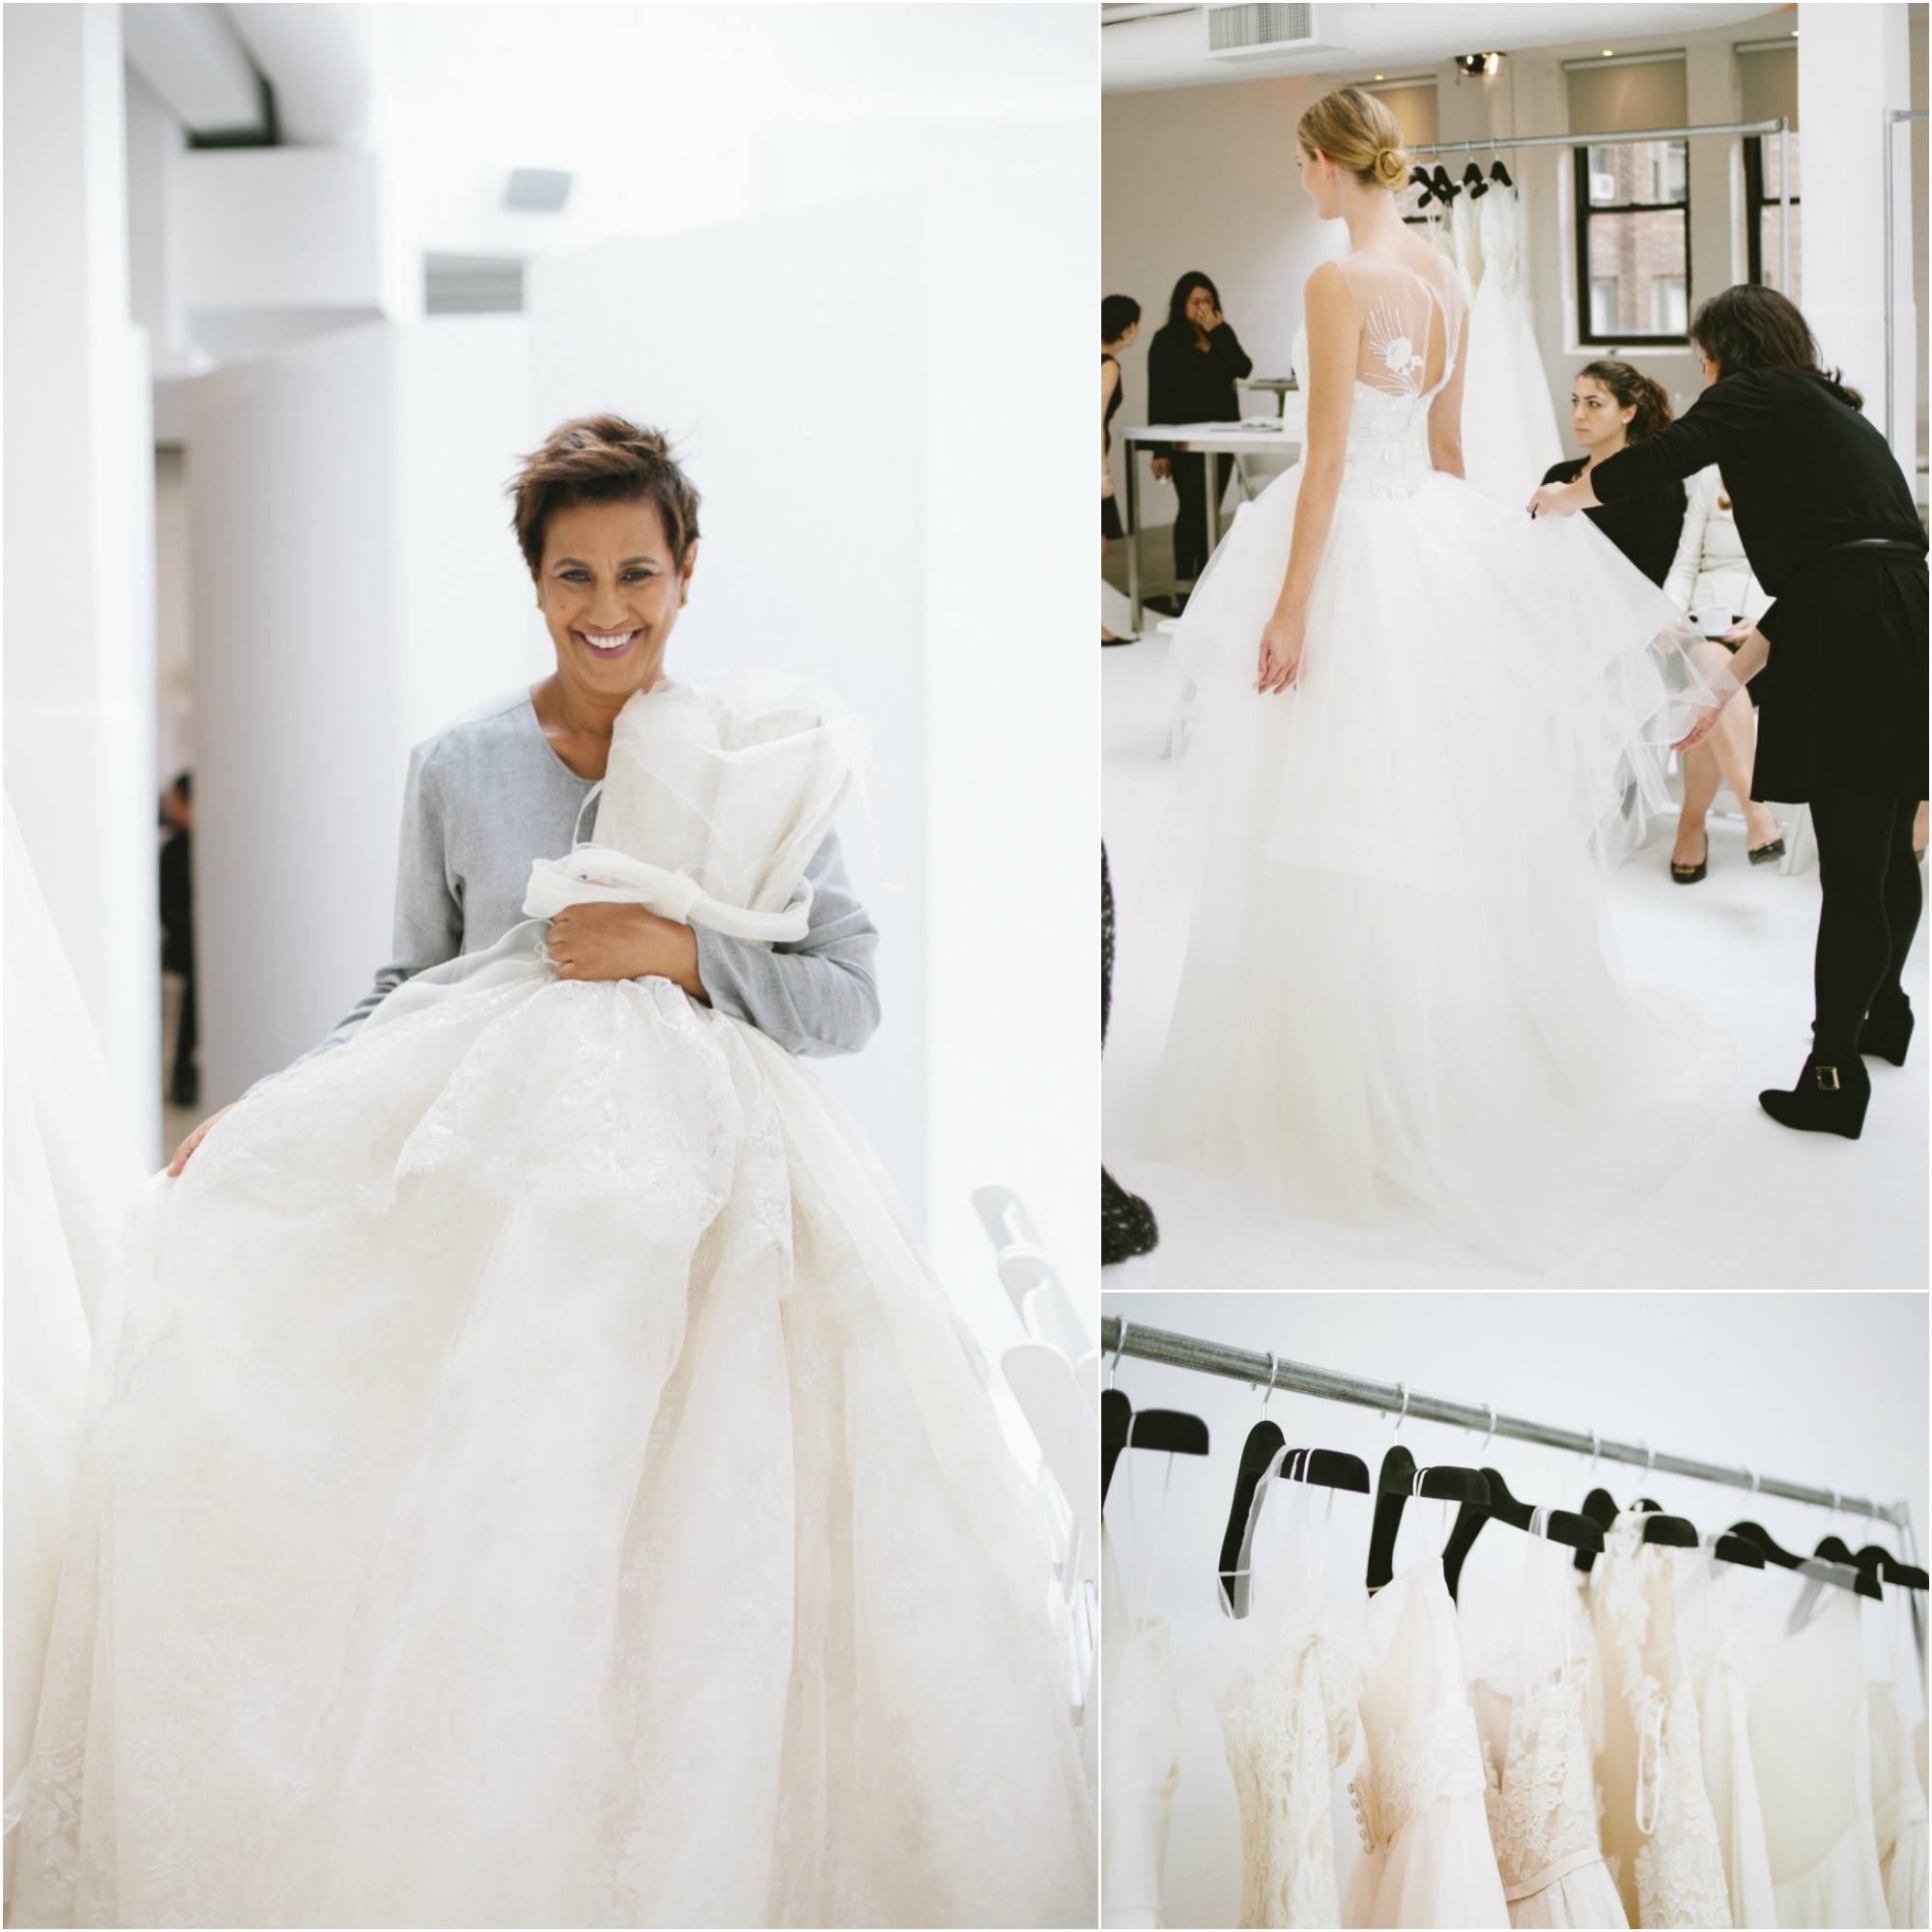 Designer, Amsale Aberra, with one of her wedding dress creations in her New York studio